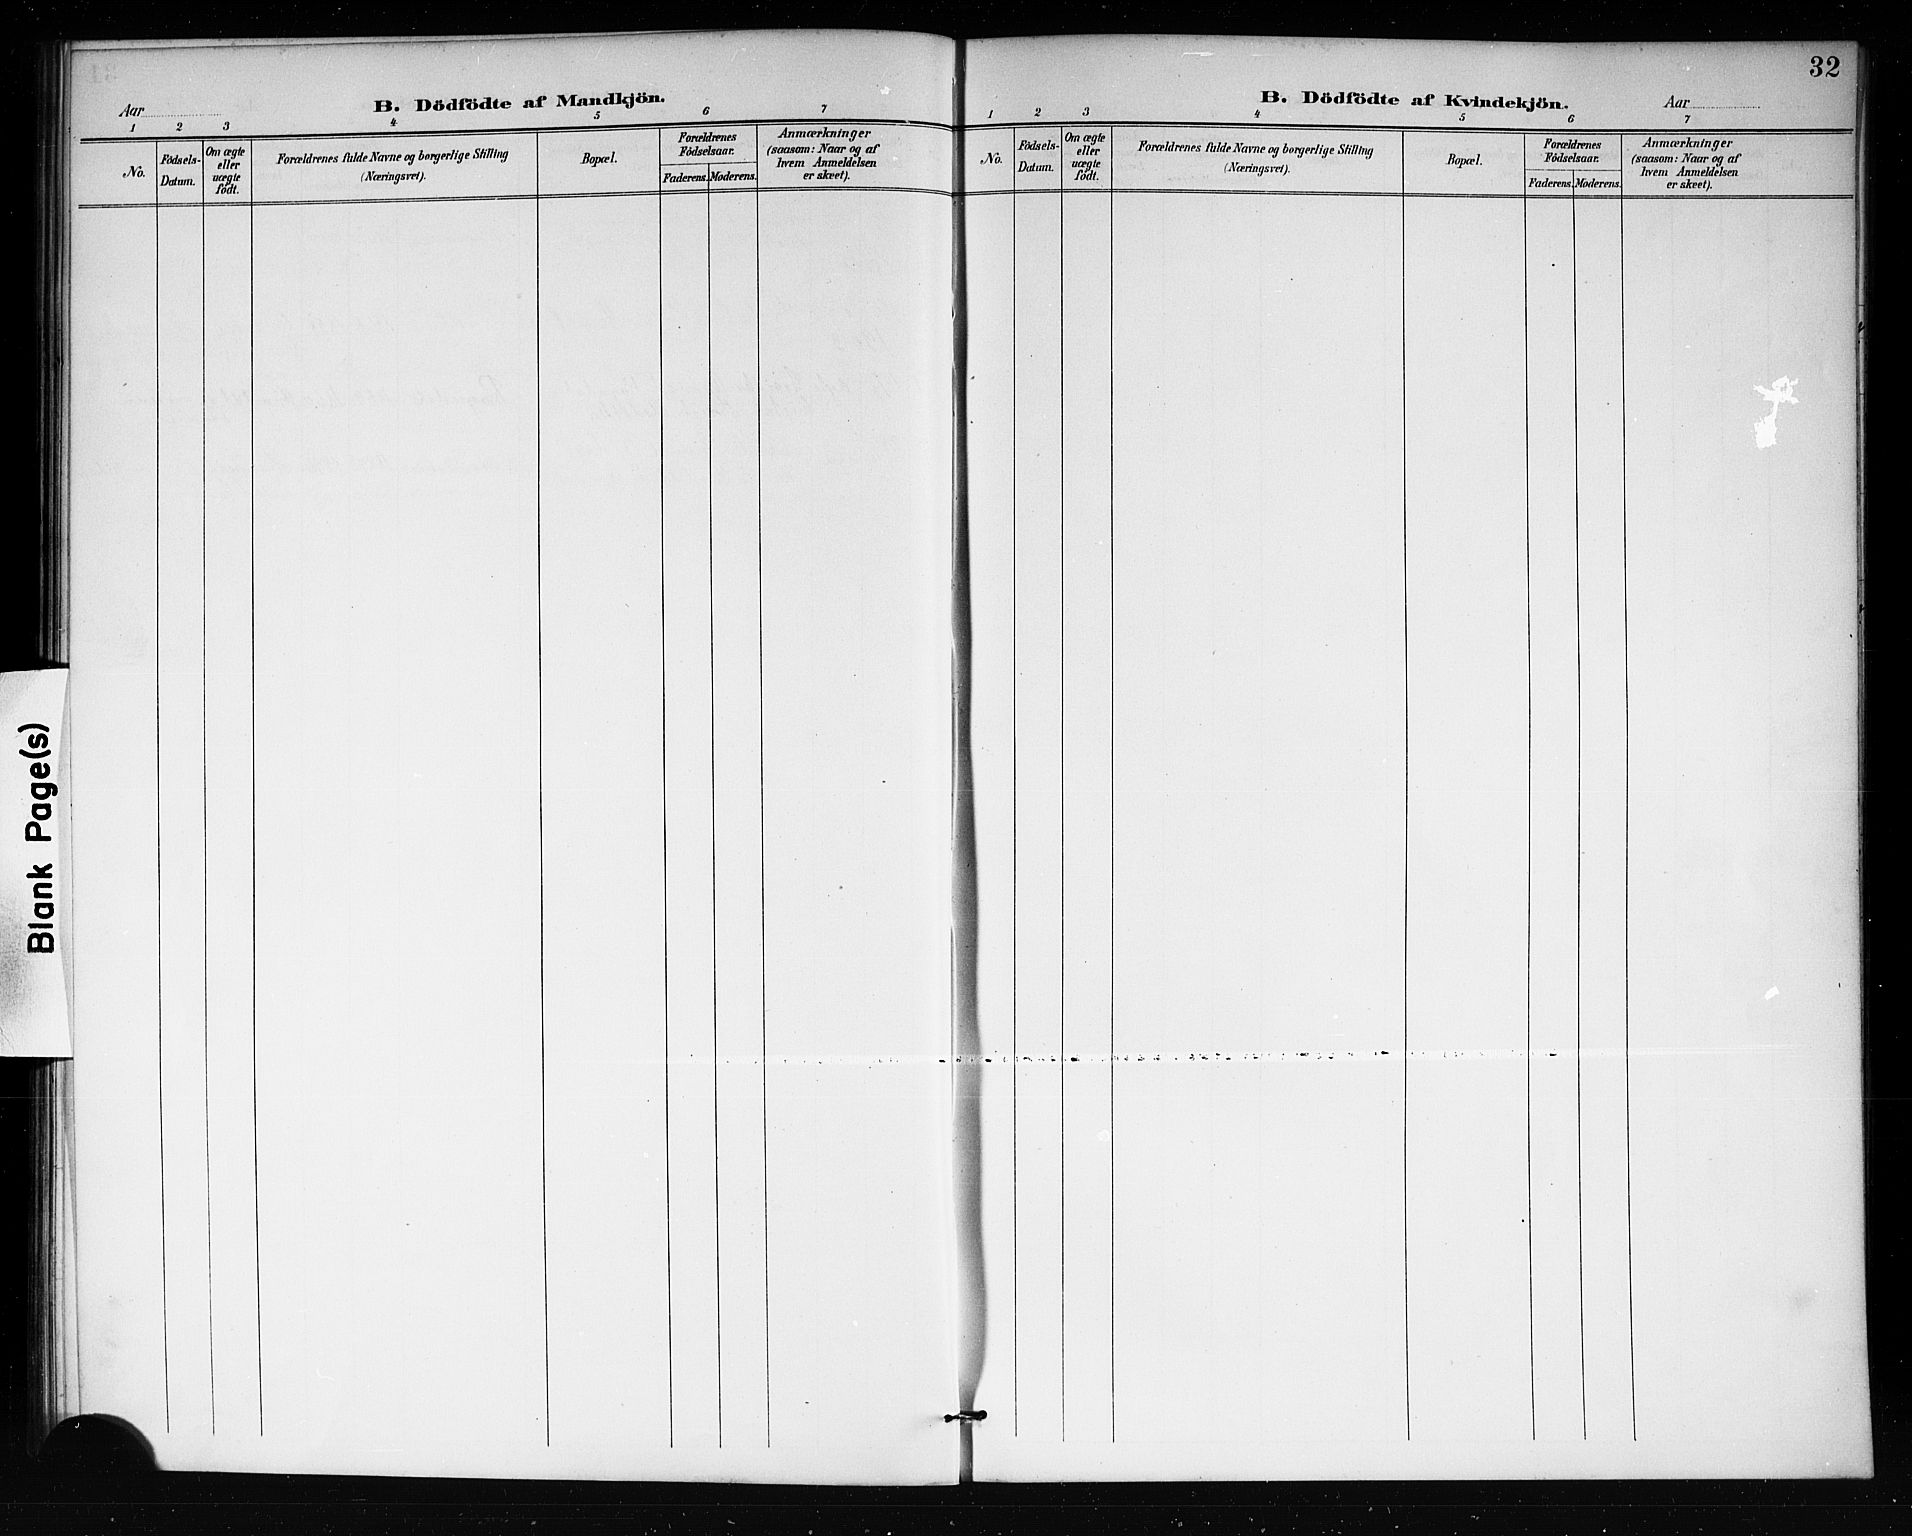 SAKO, Lårdal kirkebøker, G/Gb/L0003: Klokkerbok nr. II 3, 1889-1920, s. 32